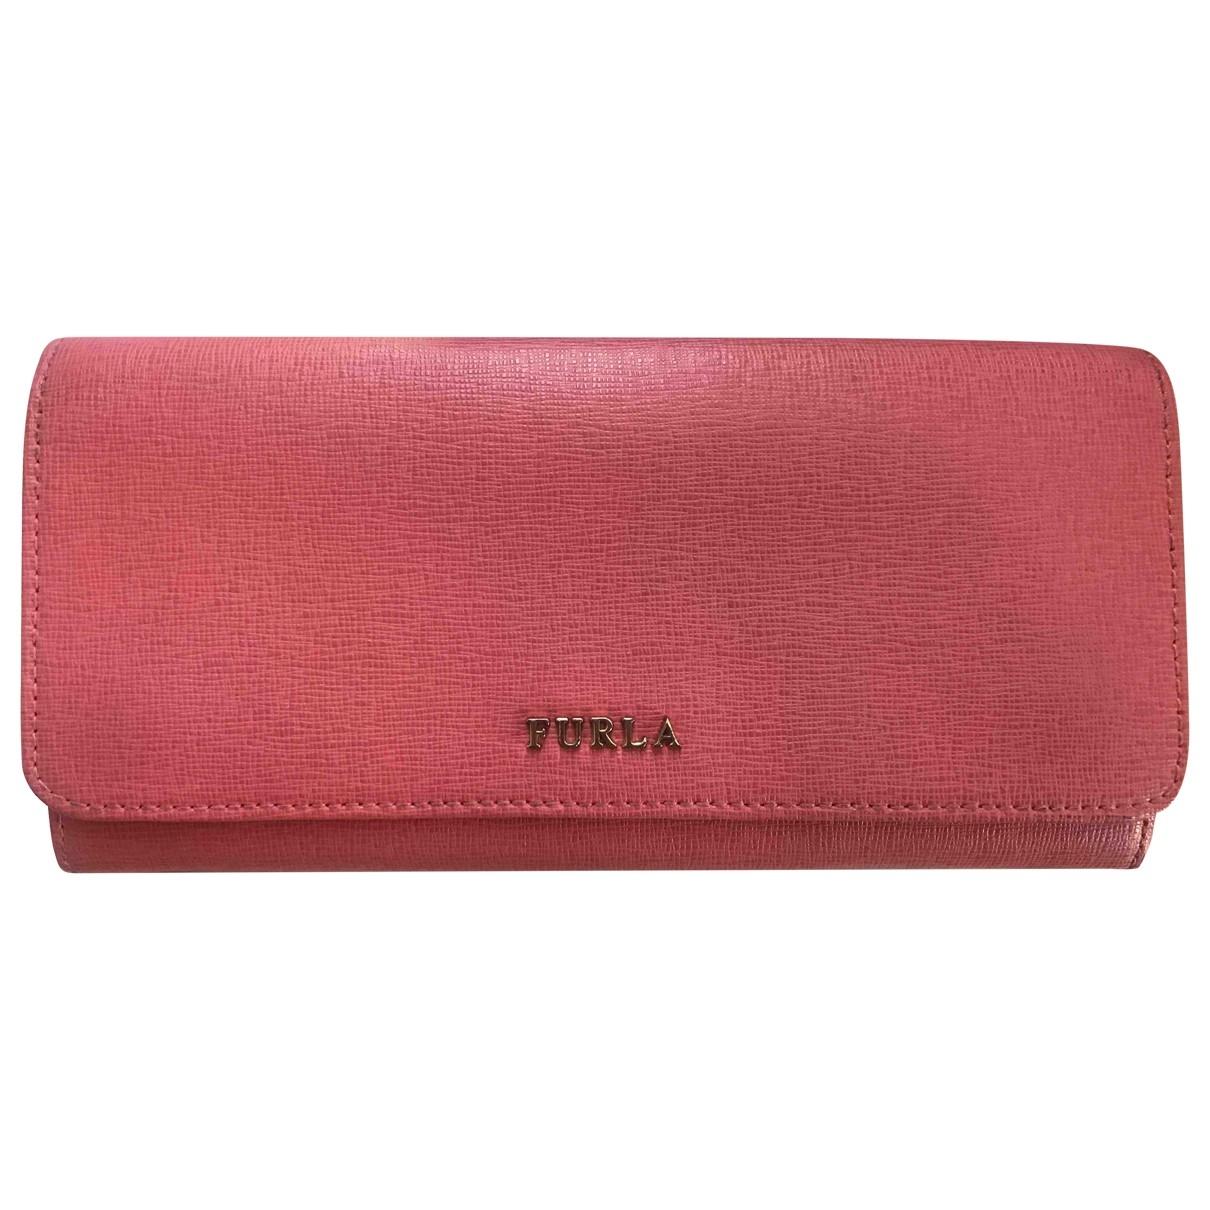 Furla \N Pink Leather wallet for Women \N